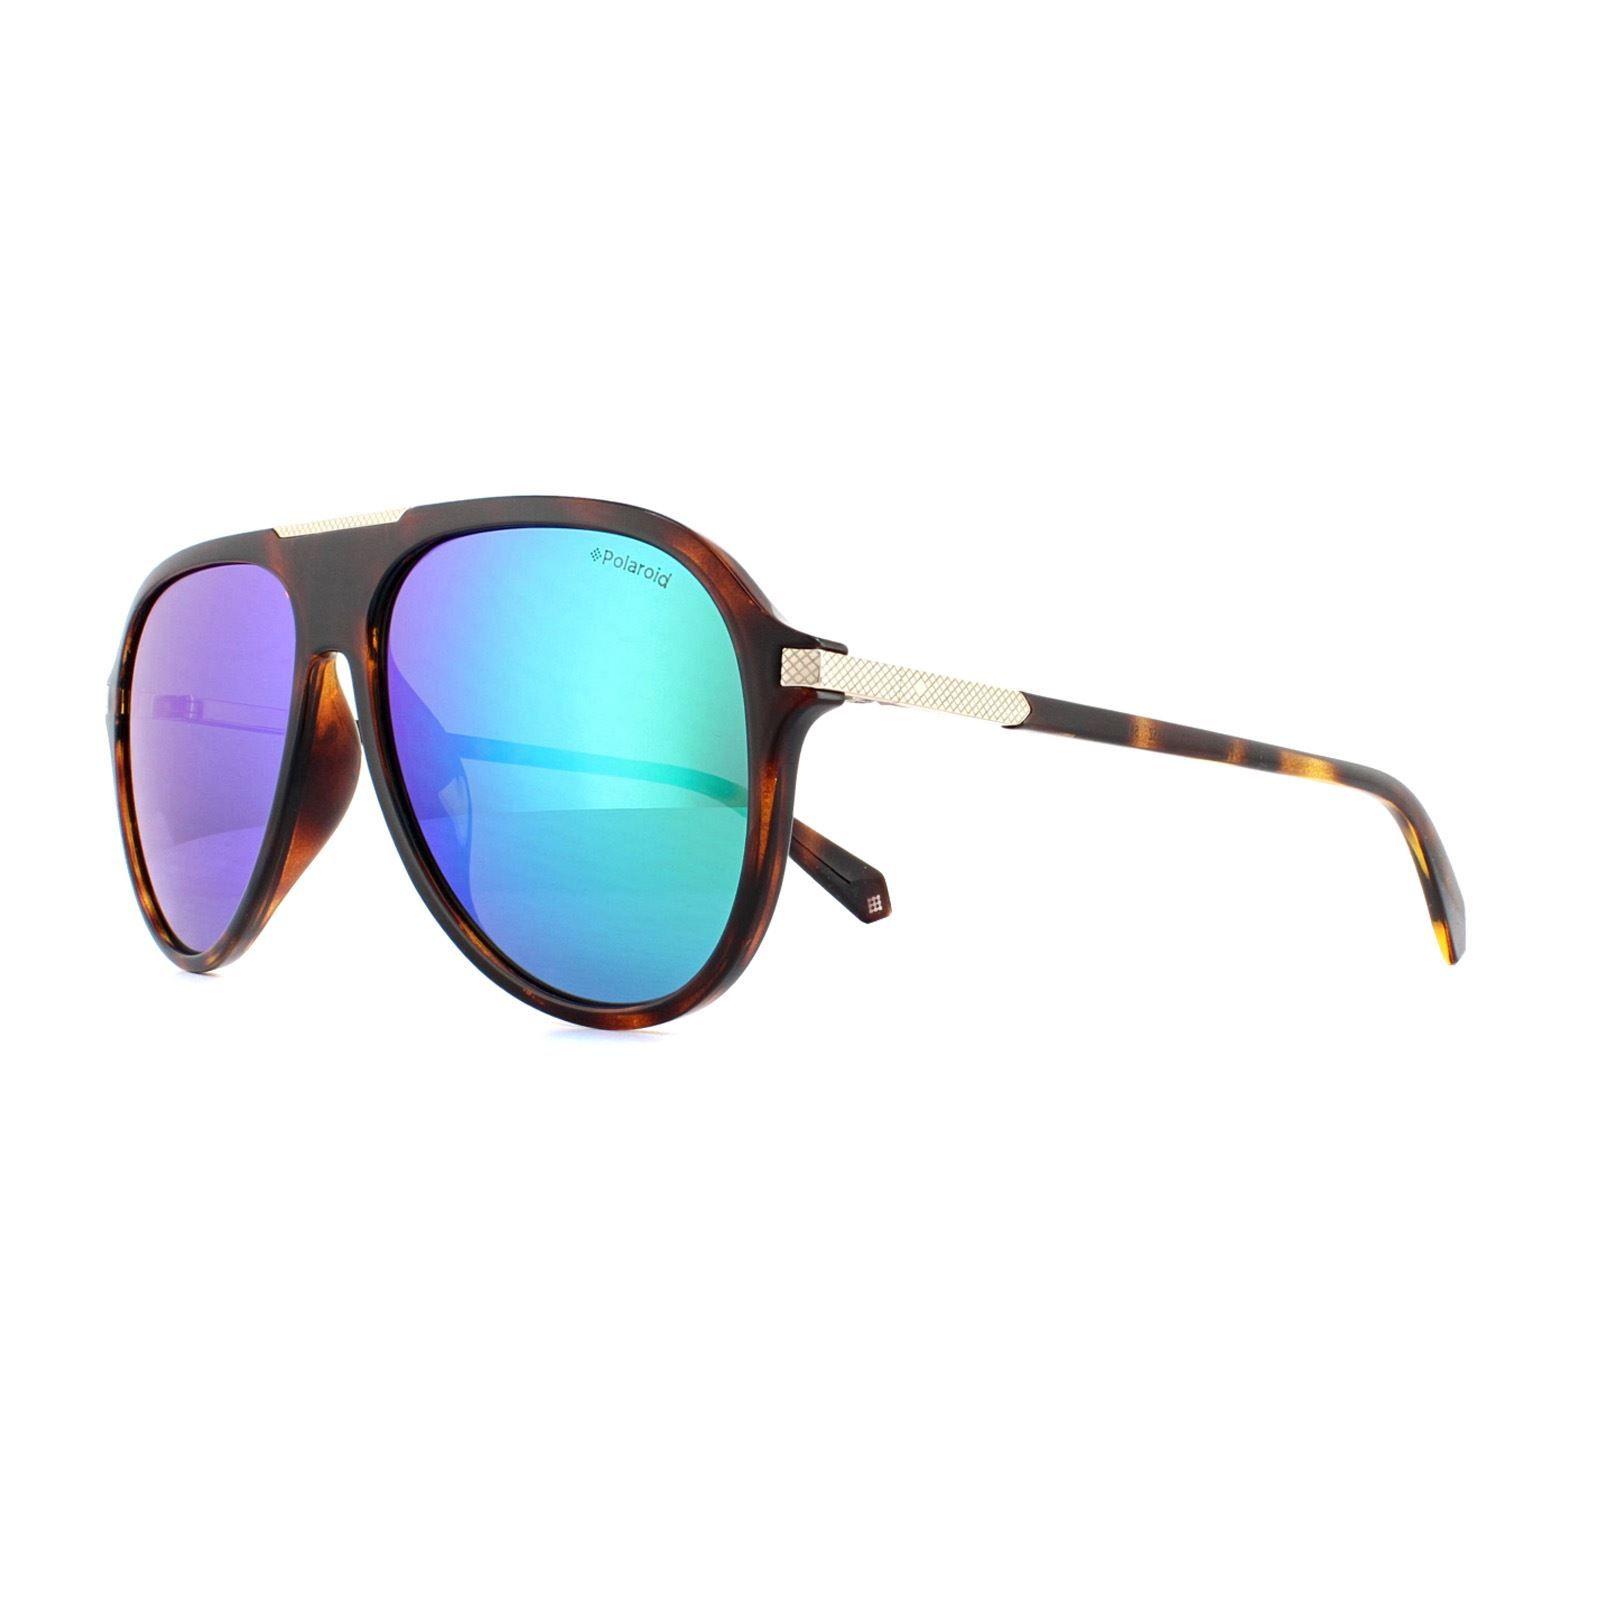 Polaroid Sunglasses PLD 2071/G/S/X 086 5Z Tortoiseshell Green Polarized